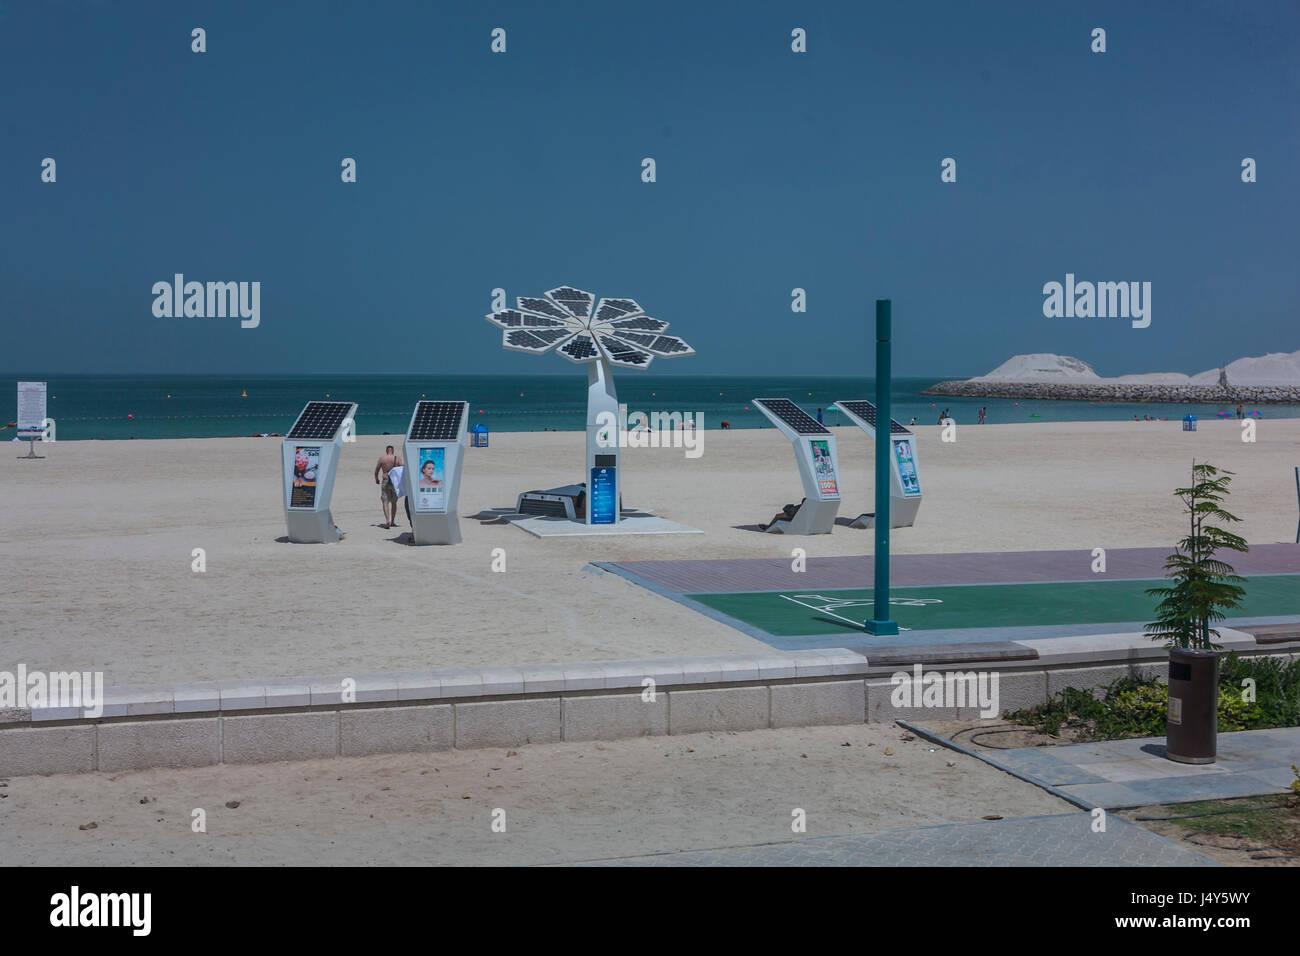 SOLAR ON THE BEACH,DUBAI, UAE-16TH AUG 2015:-The Beach is high tech with solar panels on the charging stations Stock Photo